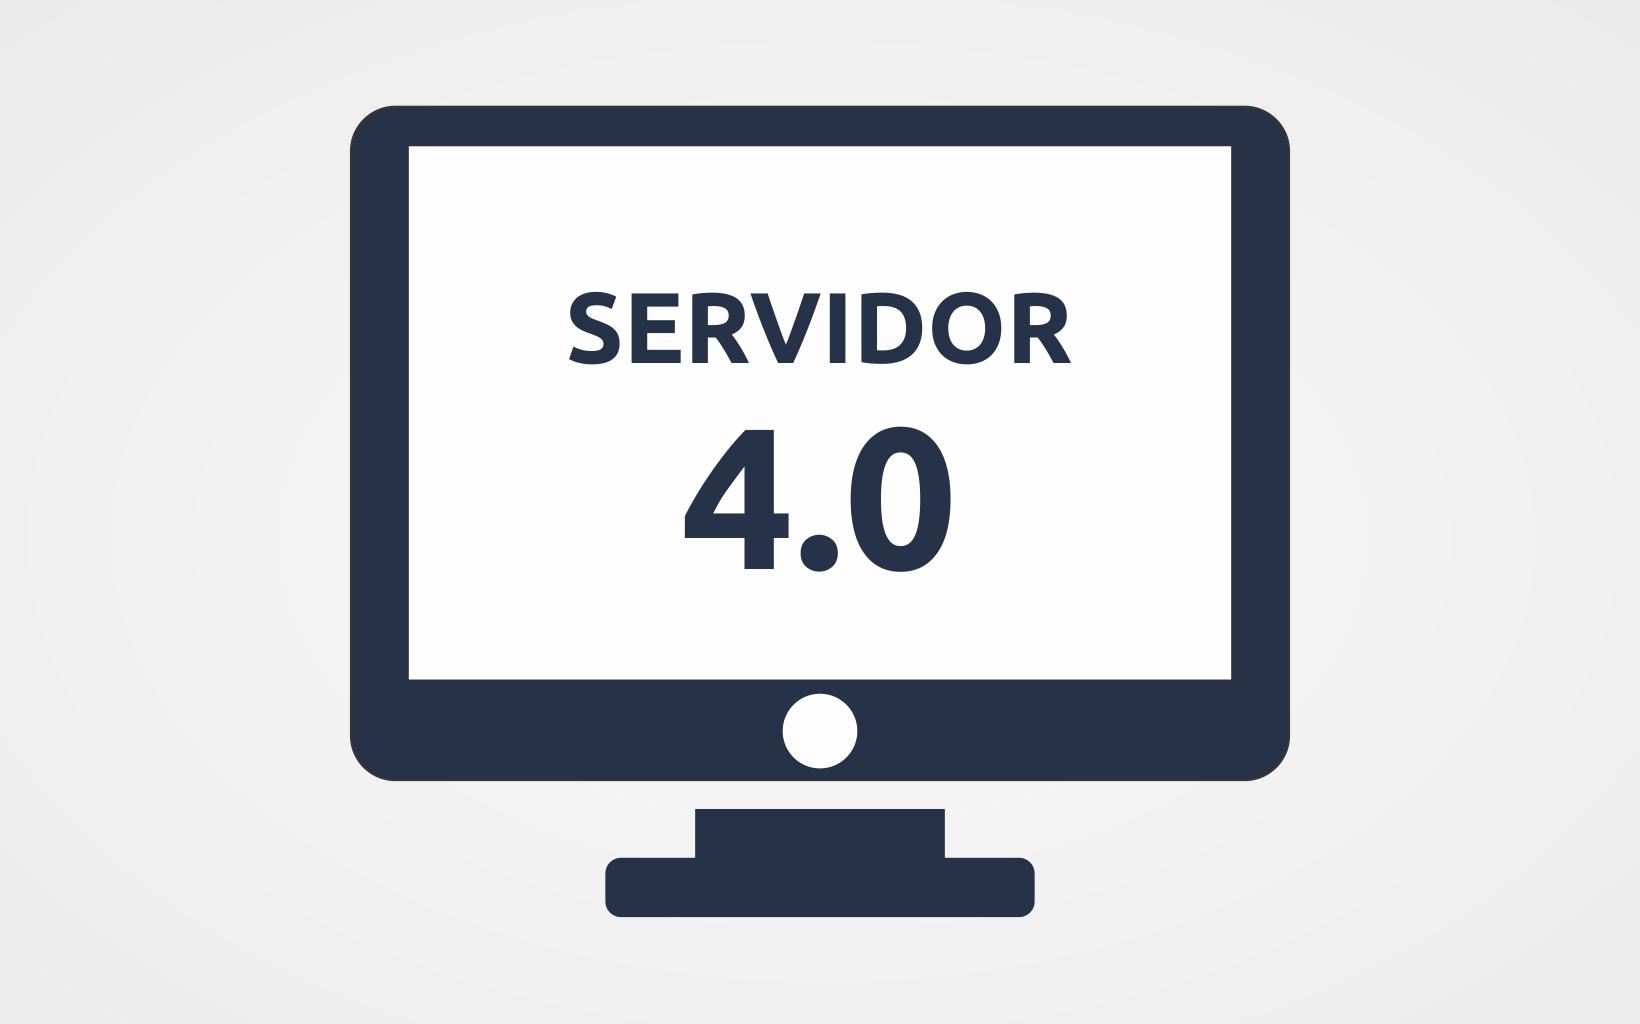 Servidor 4.0 e as Habilidades do Futuro (EAD) *Somente Para Gestores da SEDUC